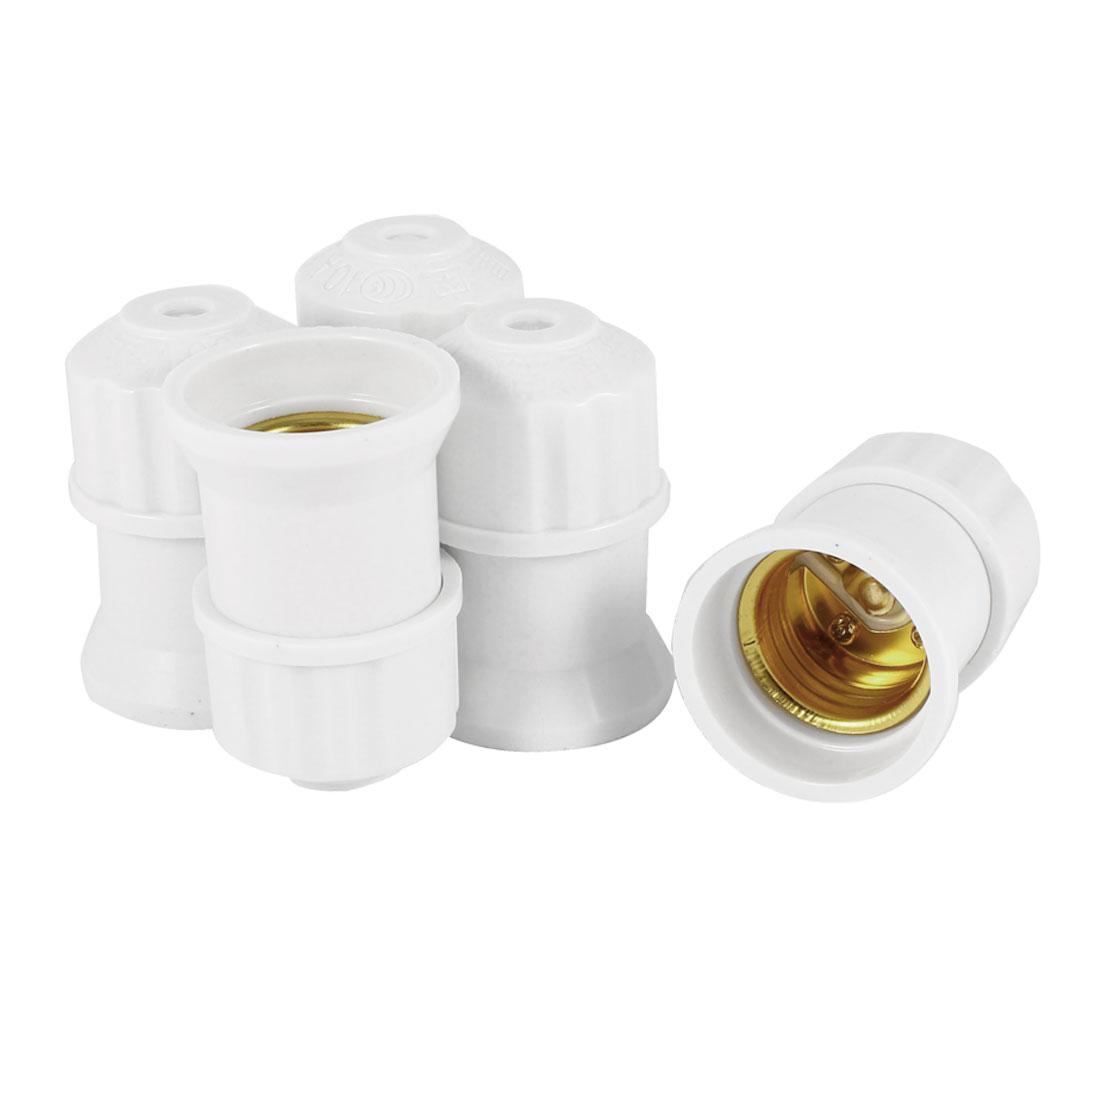 AC 250V 10A White Plastic Housing E27 Bulb Lamp Light Screw Type Holder 5 Pieces